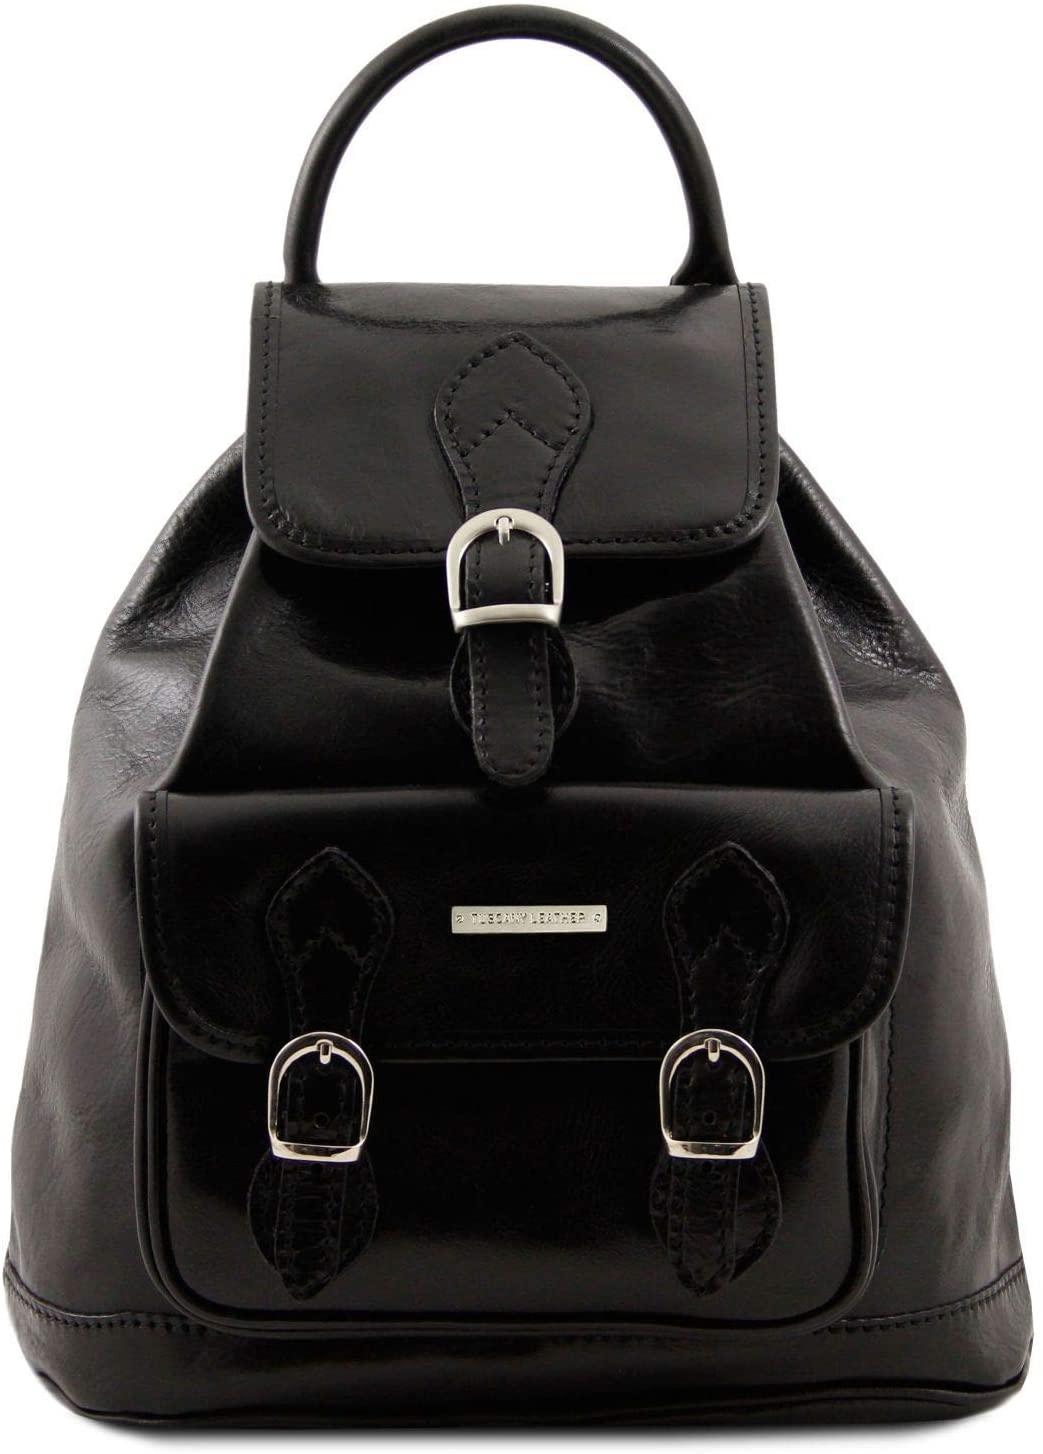 Tuscany Leather - Singapore - Leather - Backpack Black - TL9039/2